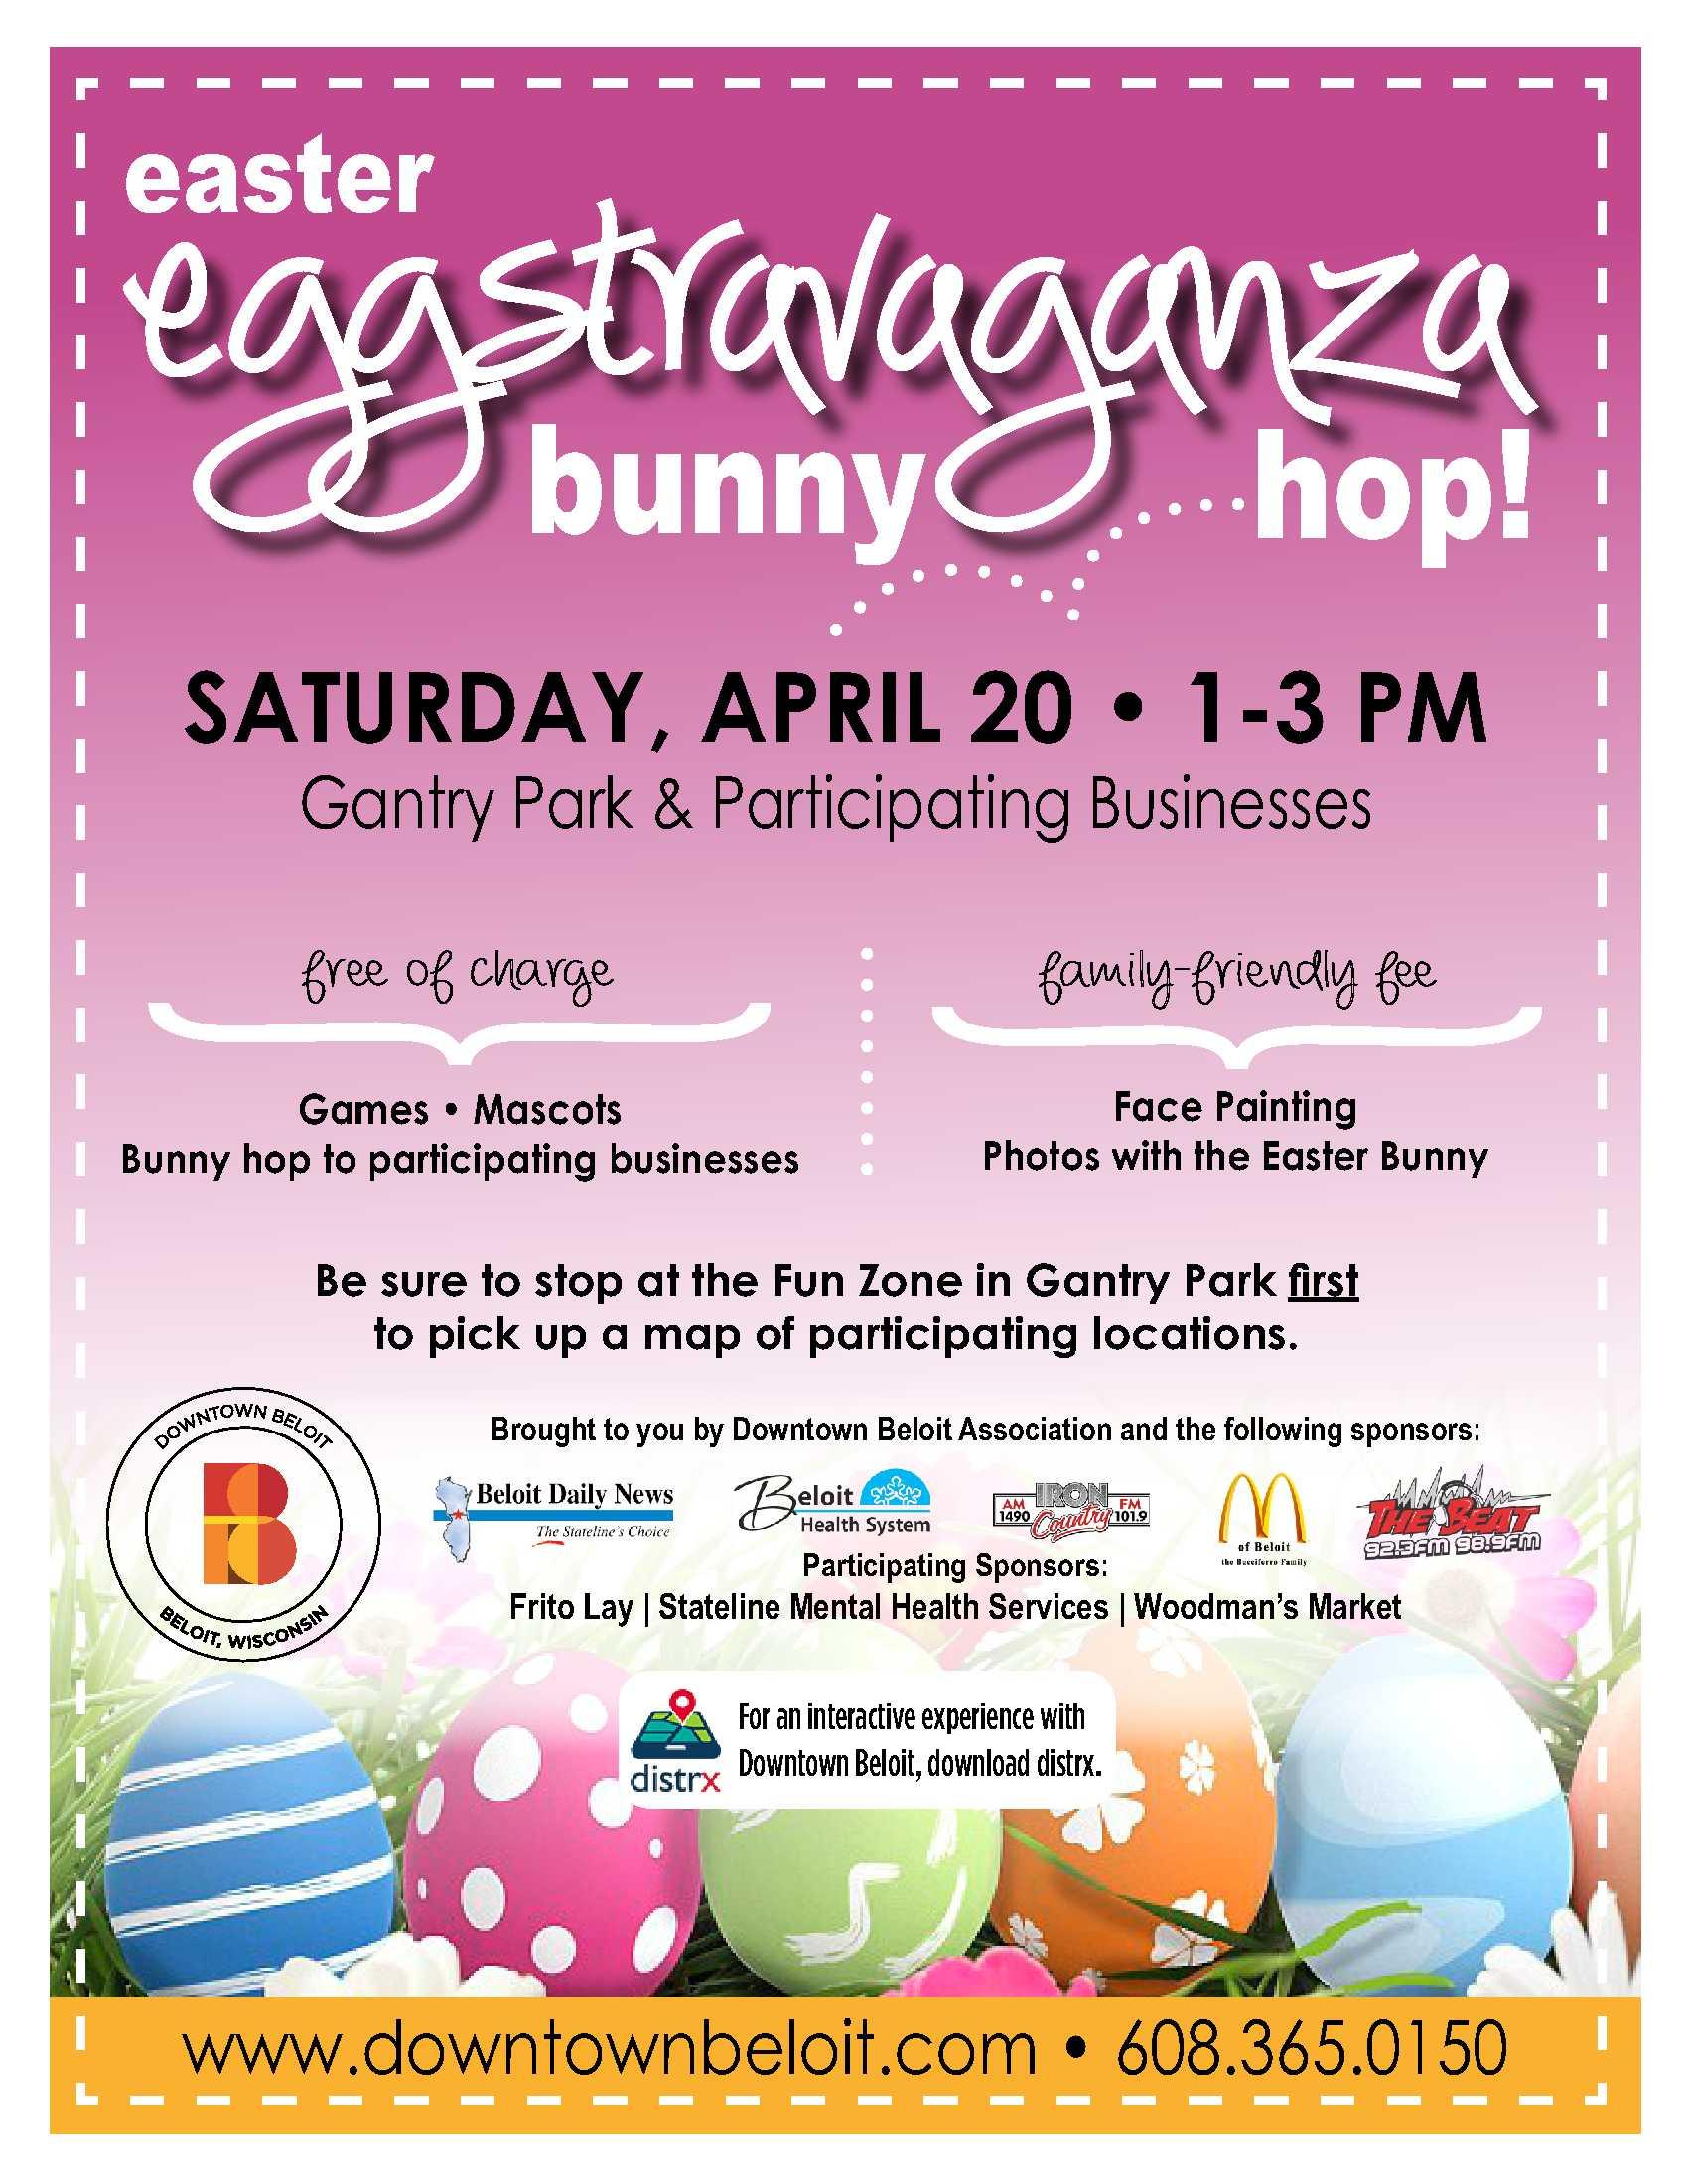 Easter Eggstravaganza Downtown Beloit Association - Easter-us-map